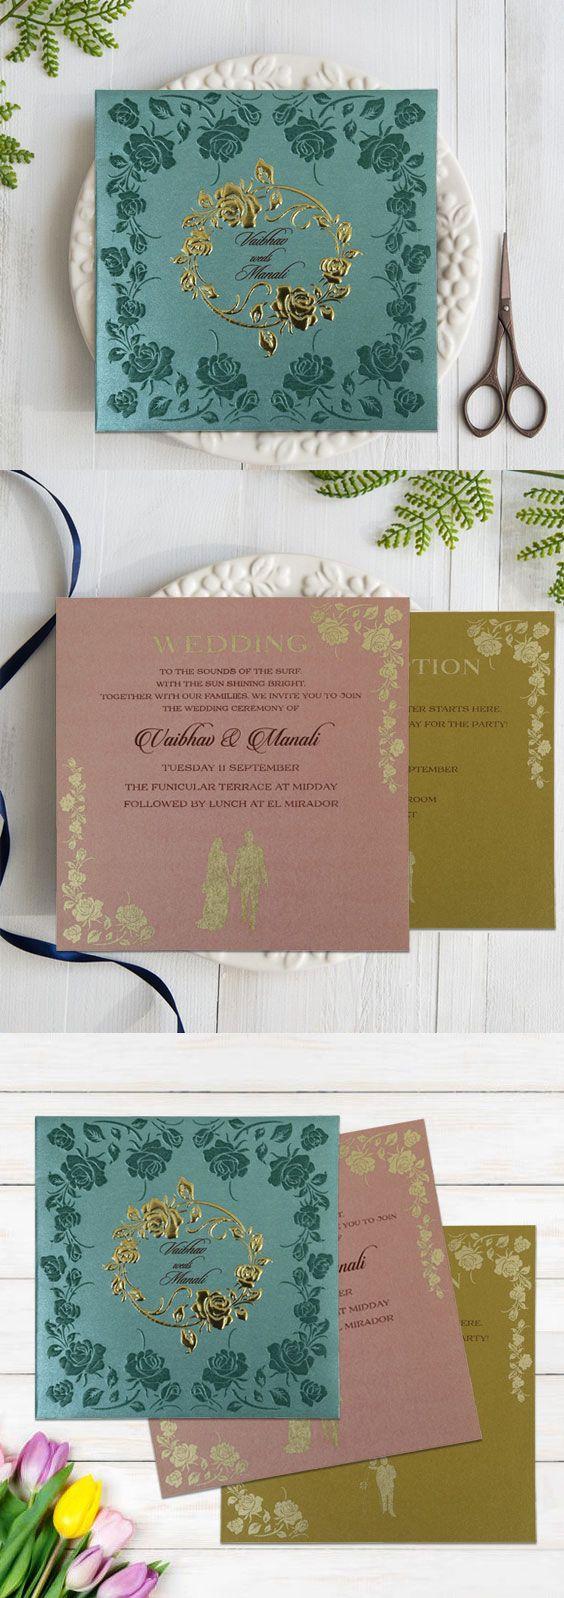 matter for wedding invitation in gujarati%0A BLUE SHIMMERY FLORAL THEMED  FOIL STAMPED WEDDING INVITATION D          WeddingCards  weddingplanning